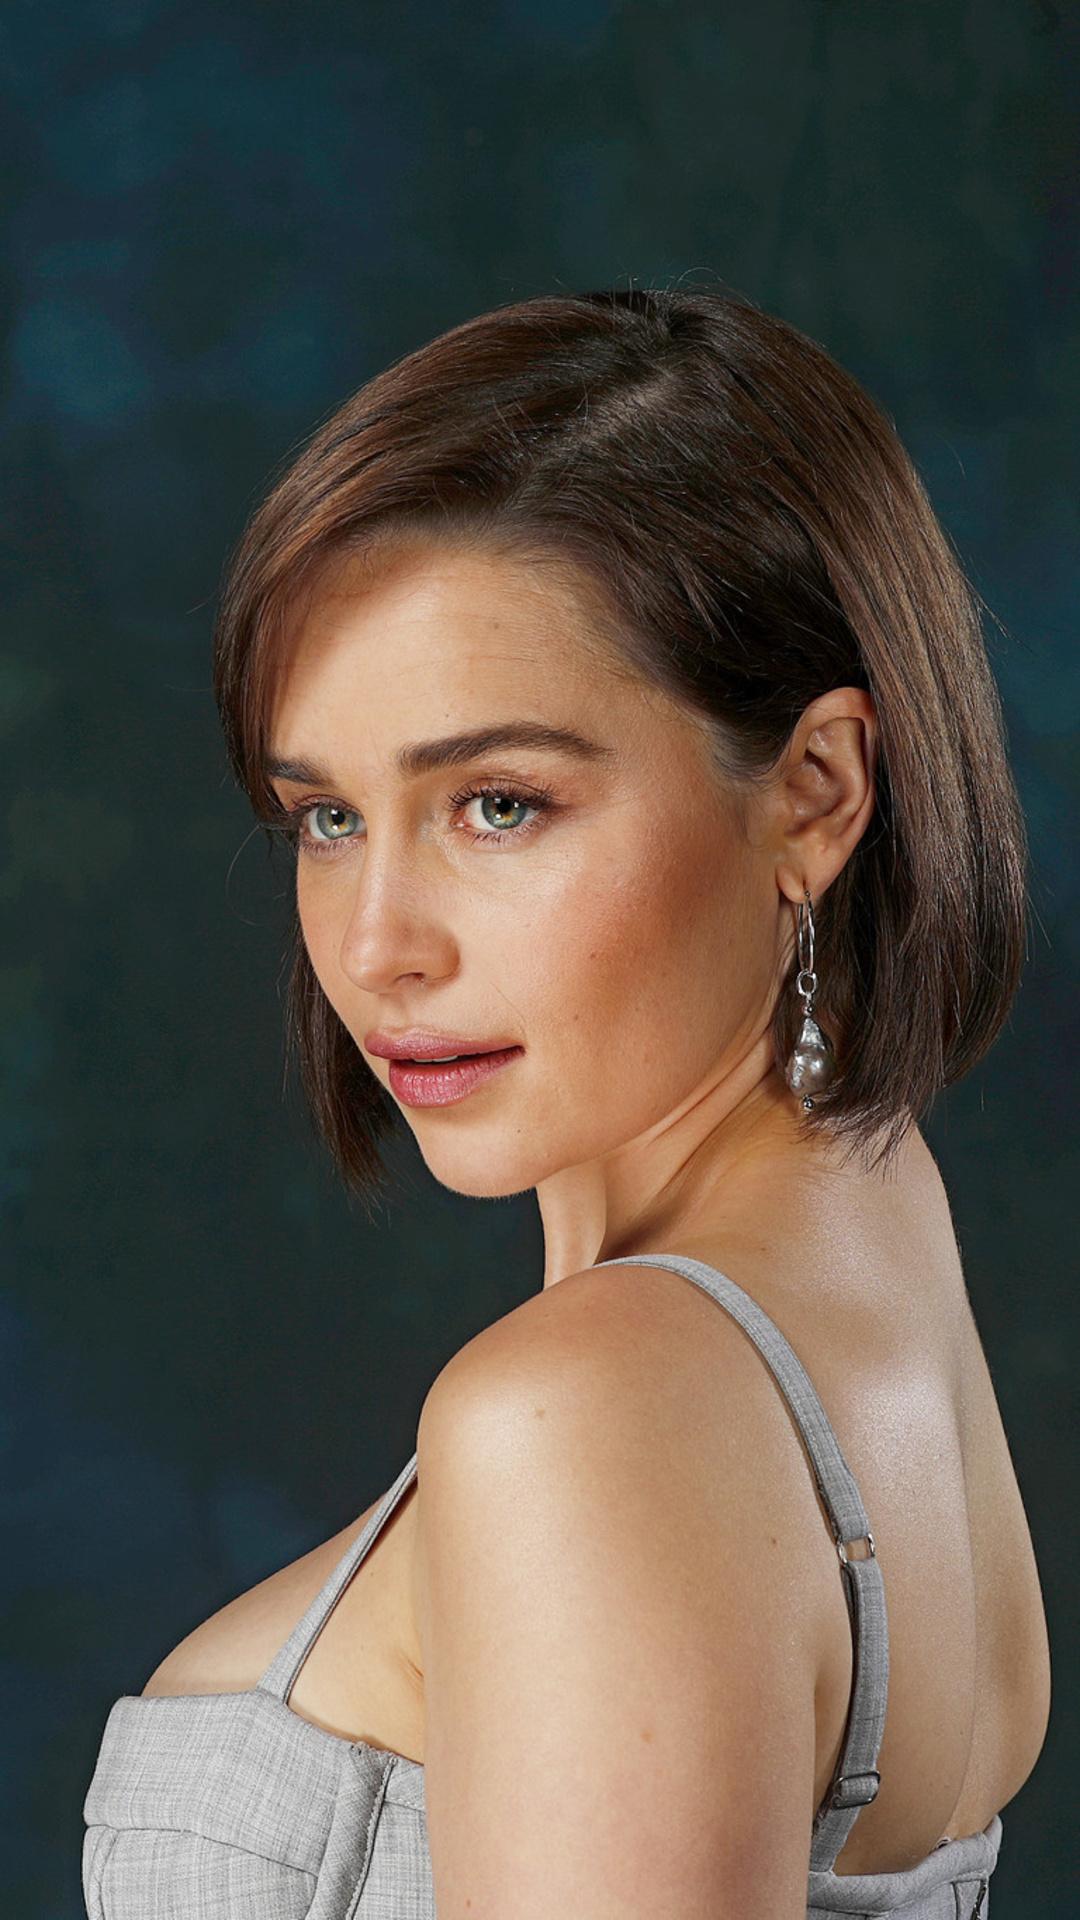 1080x1920 Emilia Clarke Short Hairs Iphone 7,6s,6 Plus ...